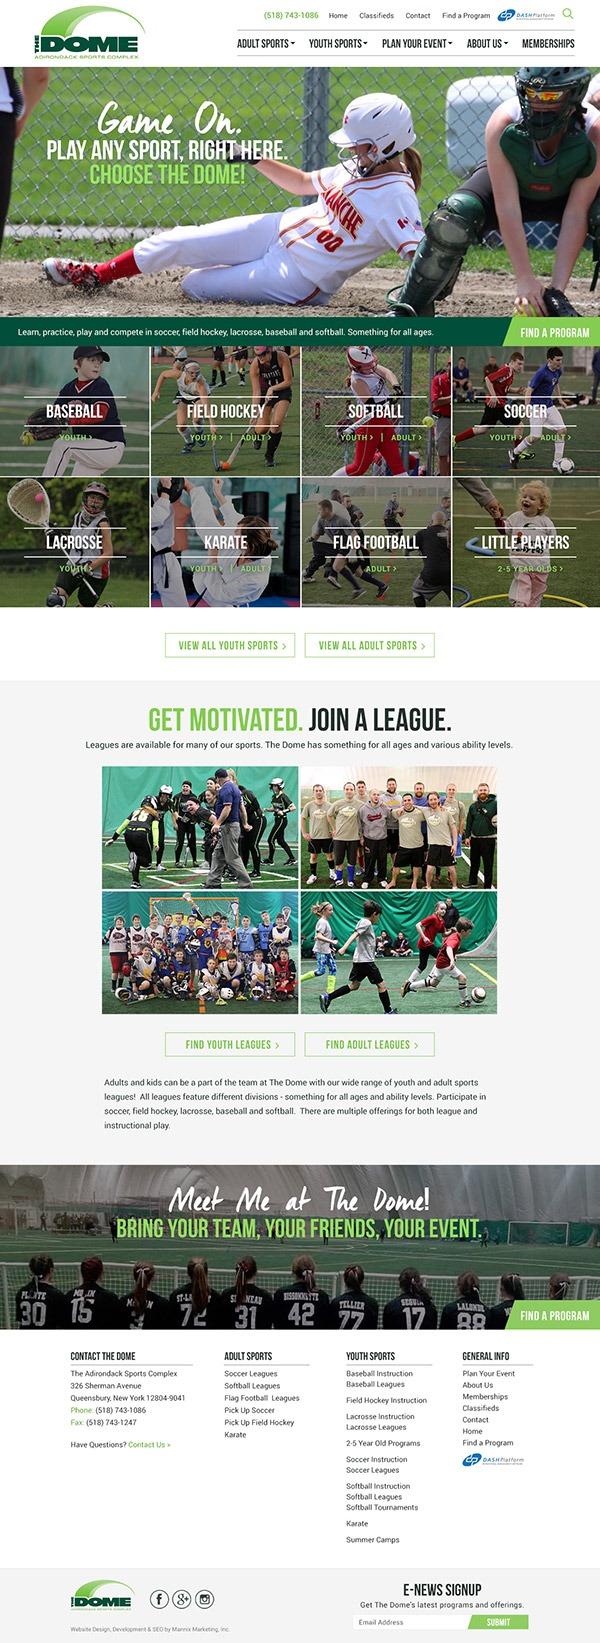 The Dome Adirondack Sports Complex Website Design and Development